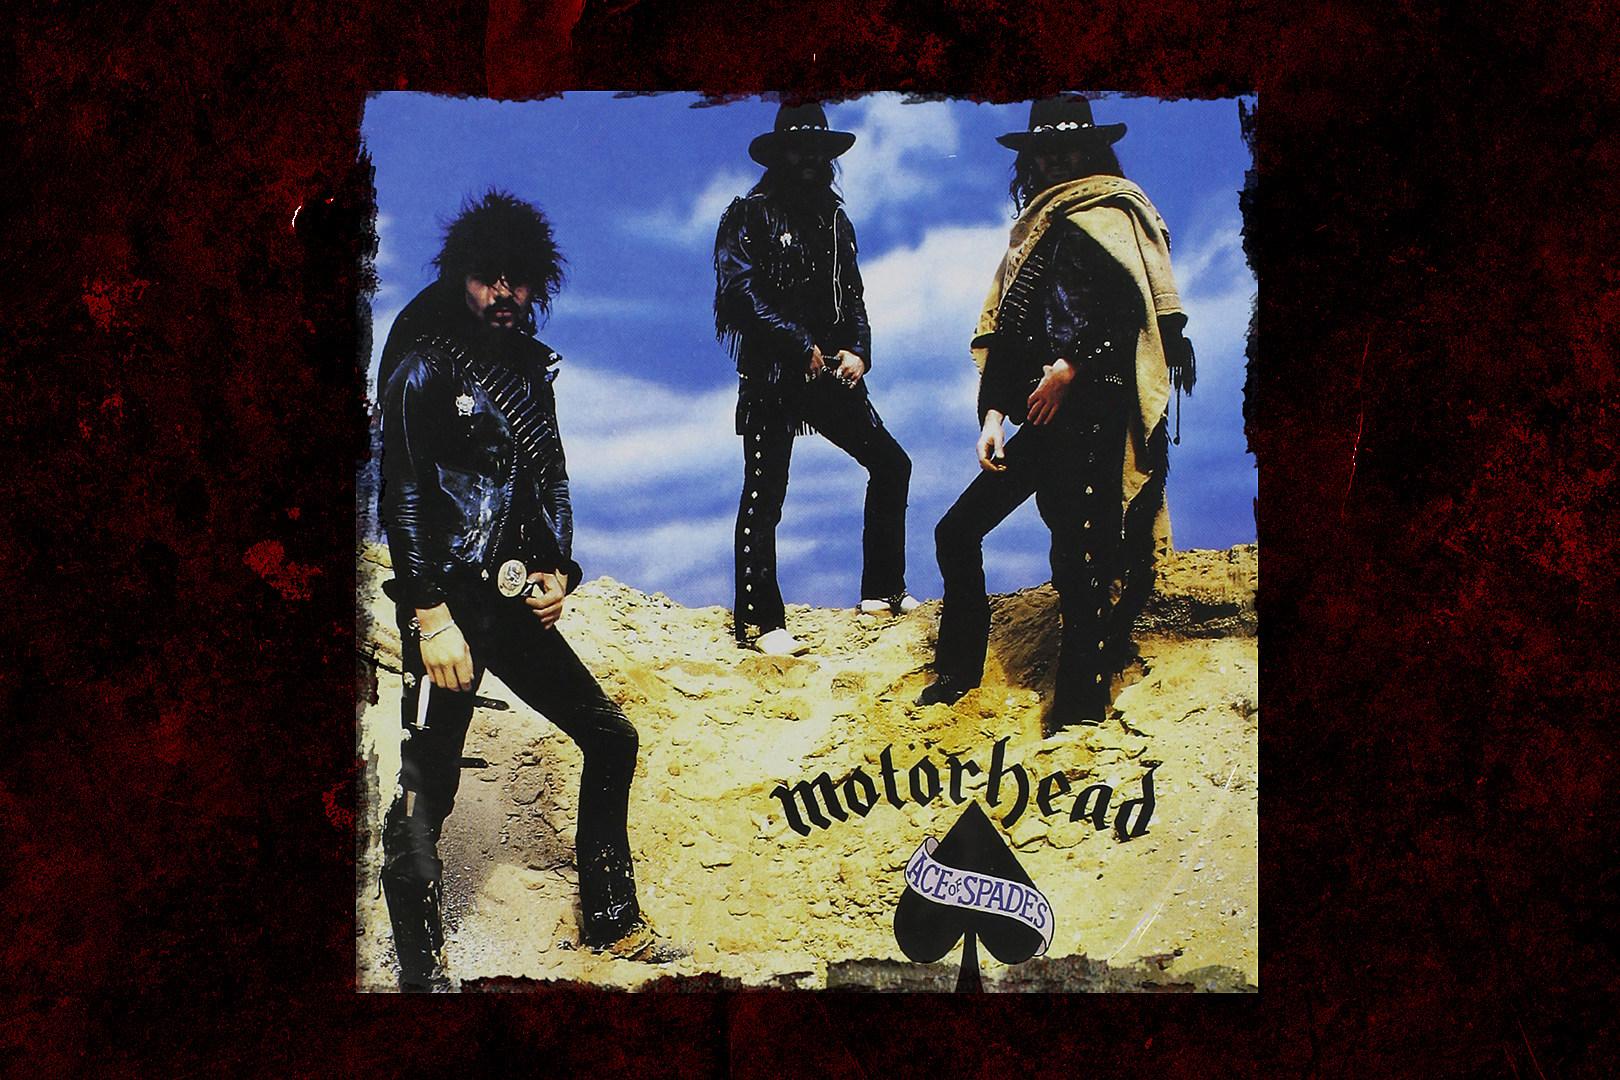 39 Years Ago: Motorhead Burst Into Metal Mainstream 'Ace of Spades'